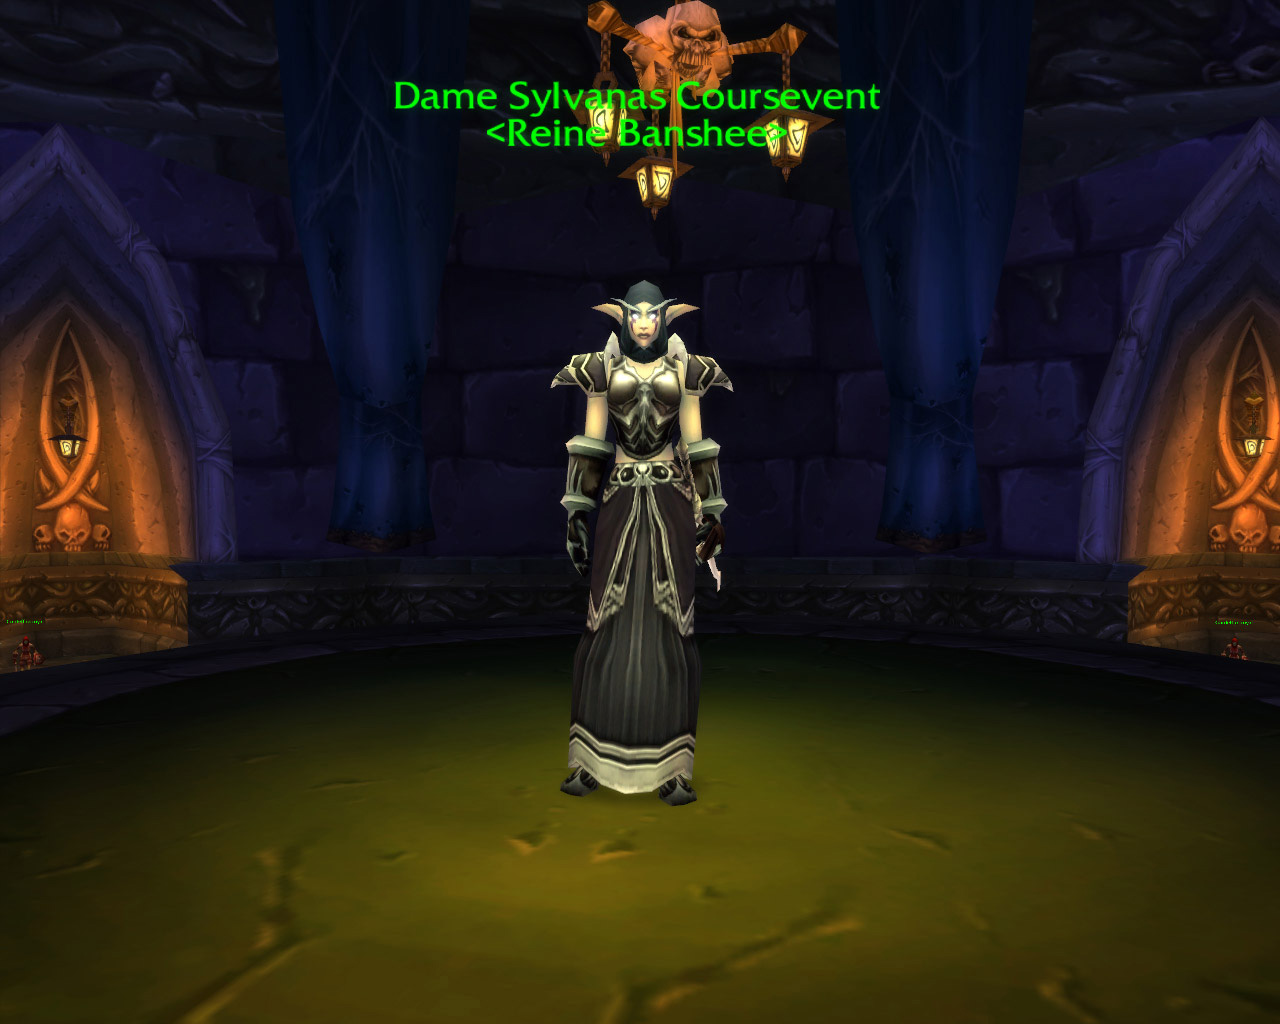 Sylvanas Coursevent dans World of Warcraft.